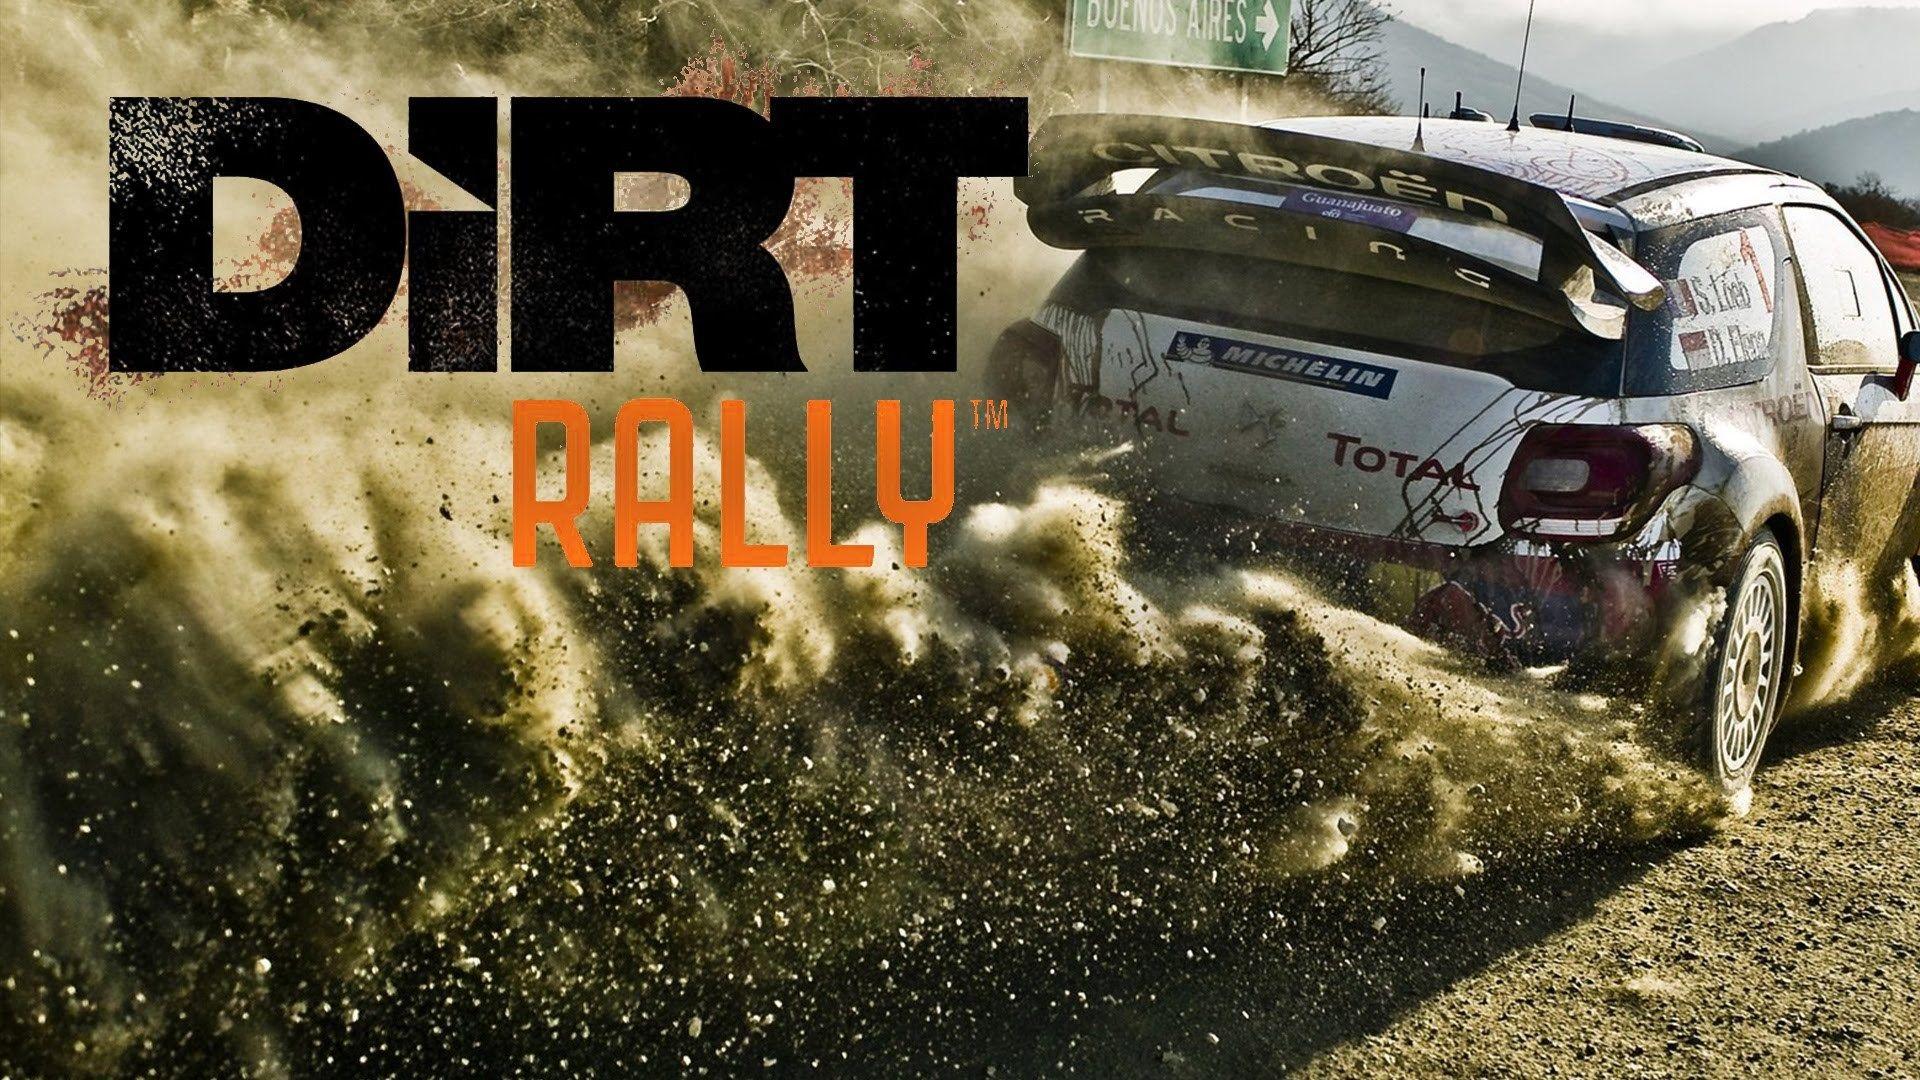 Dirt rally wallpaper for mac 563 kb essex london